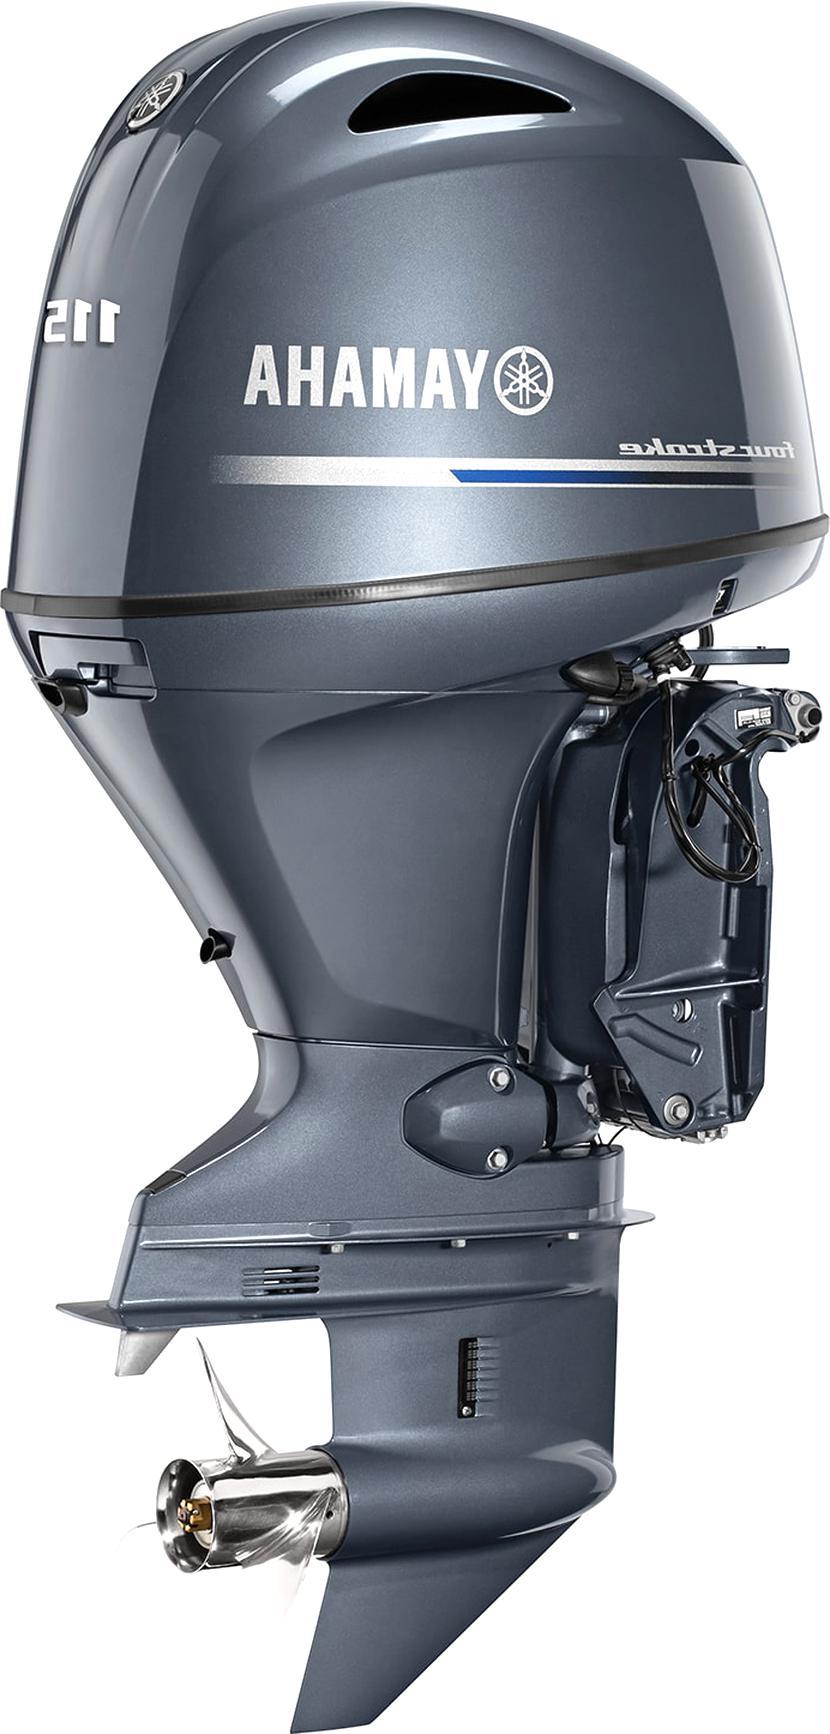 yamaha boat motor for sale